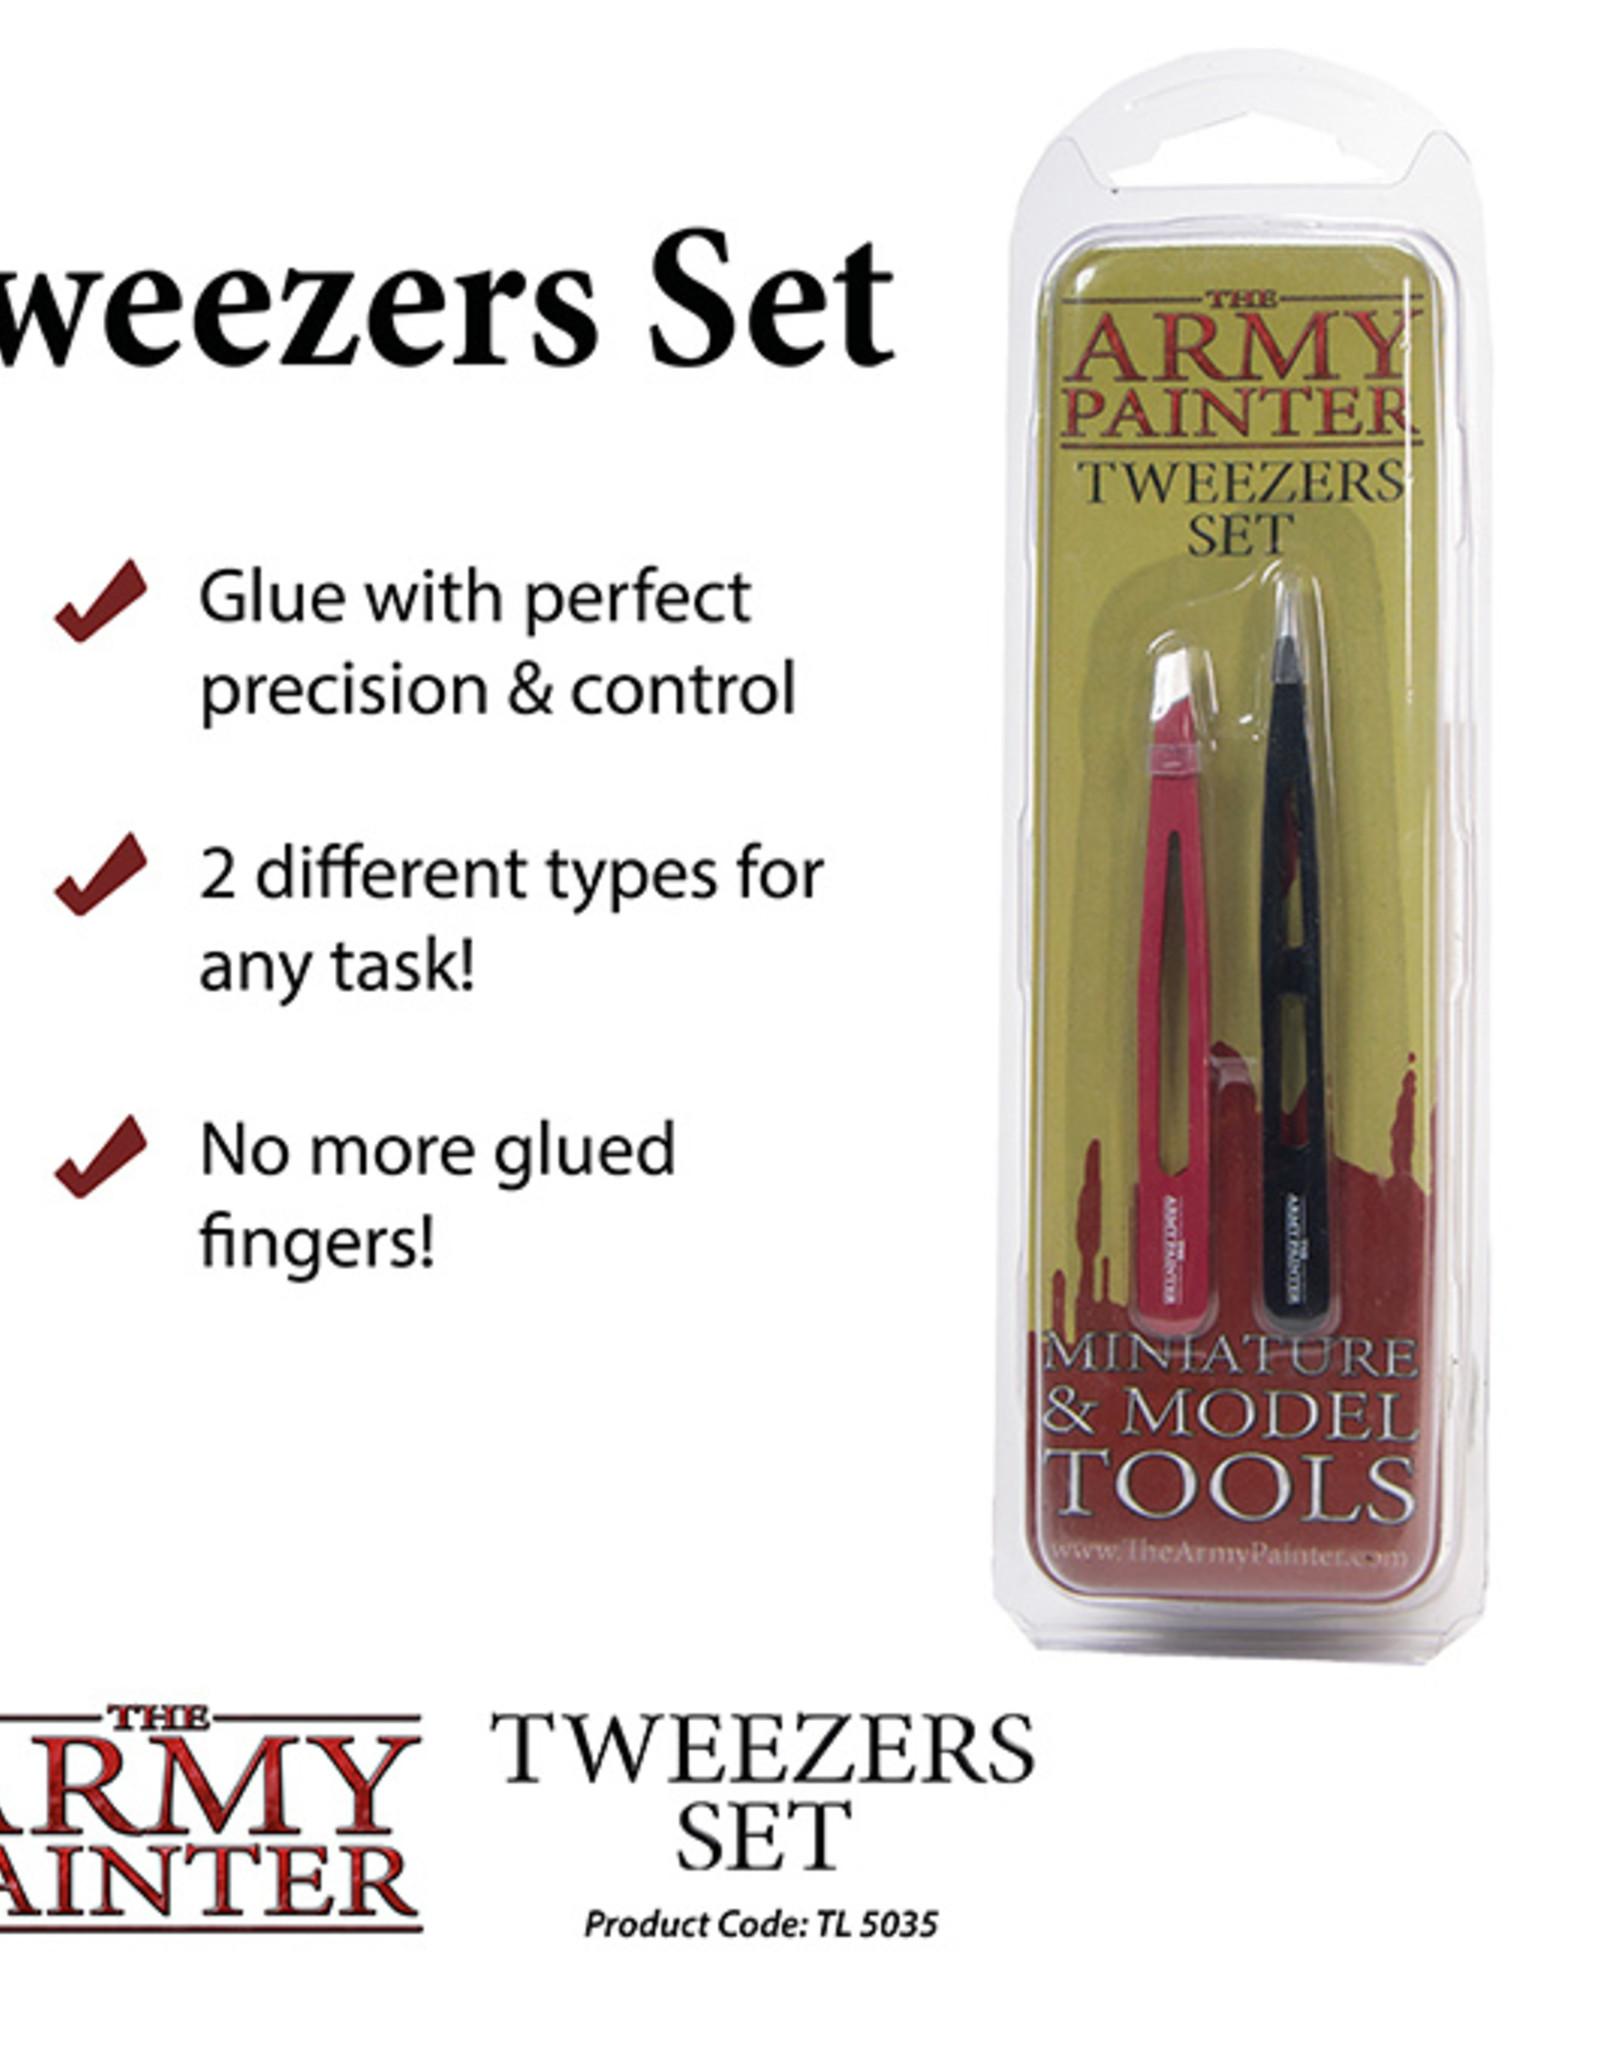 Army Painter: Tweezers